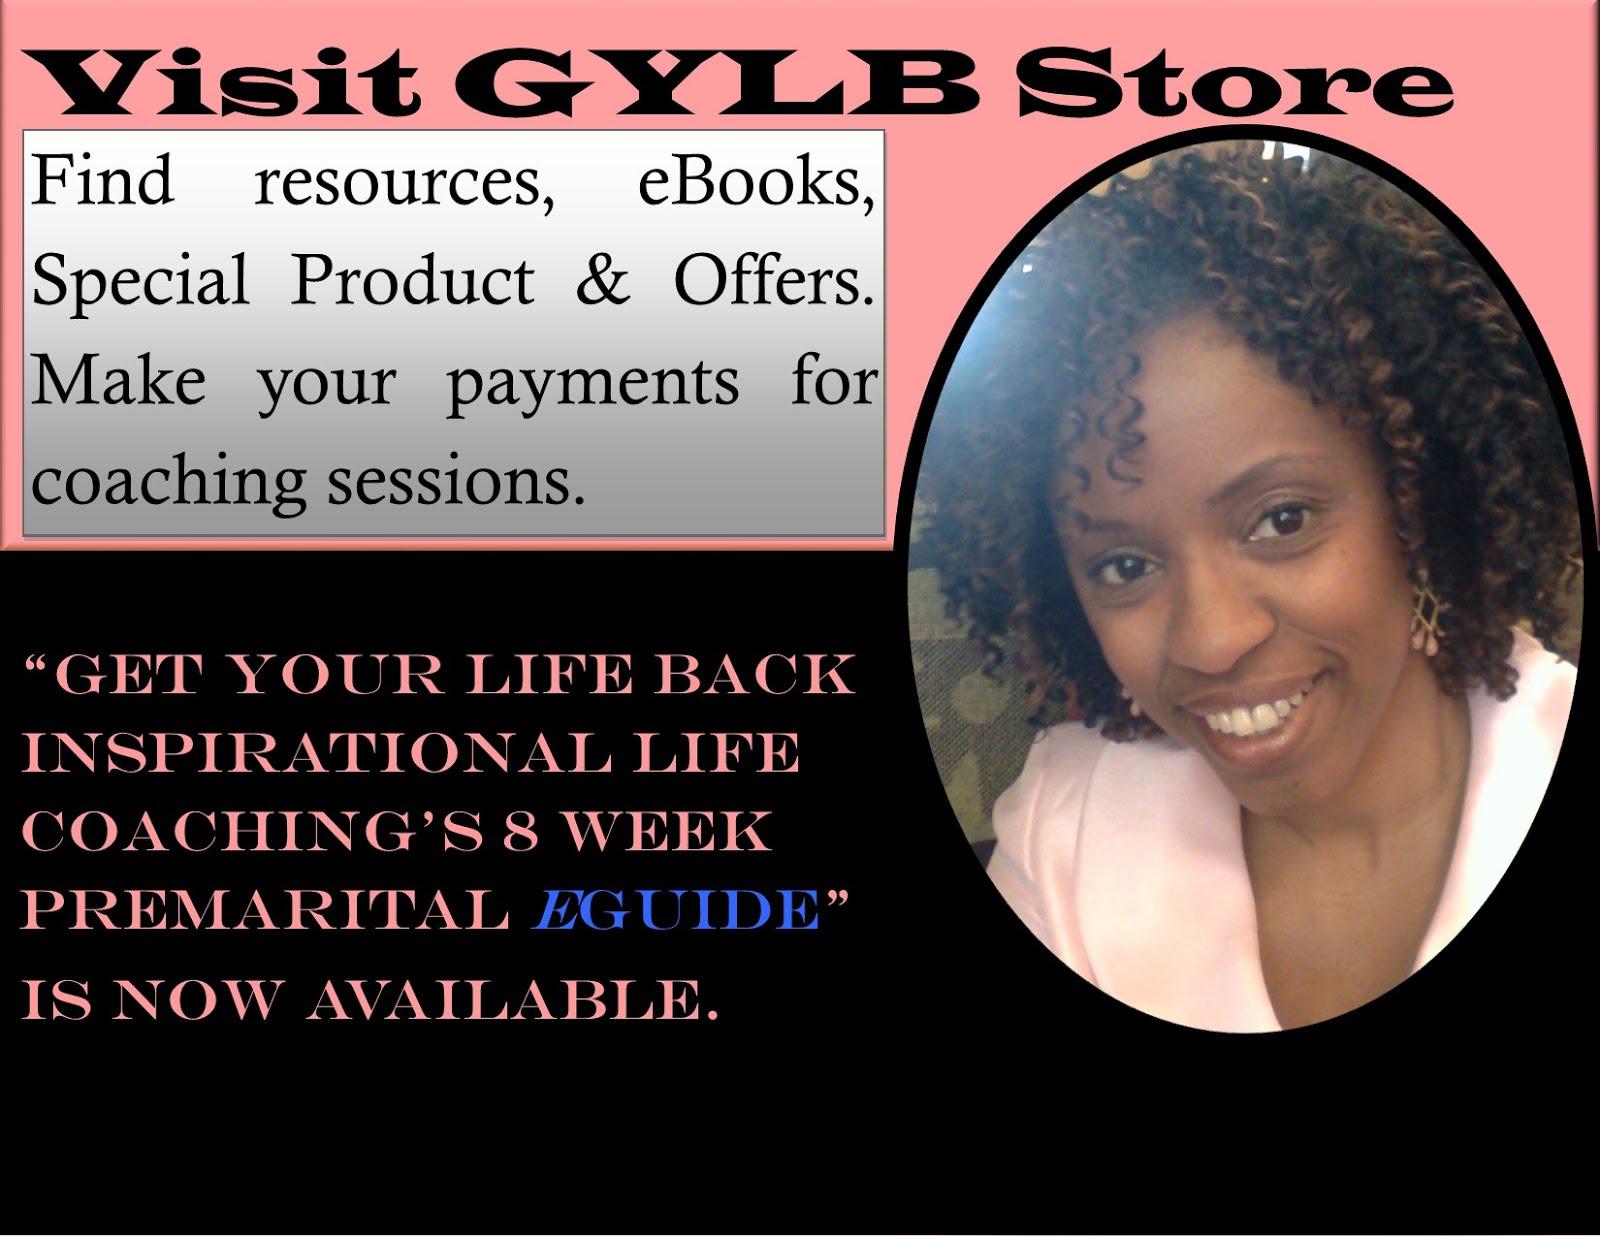 GET YOUR LIFE BACK INSPIRATIONAL LIFE COACHING'S PREMARITAL eBOOK